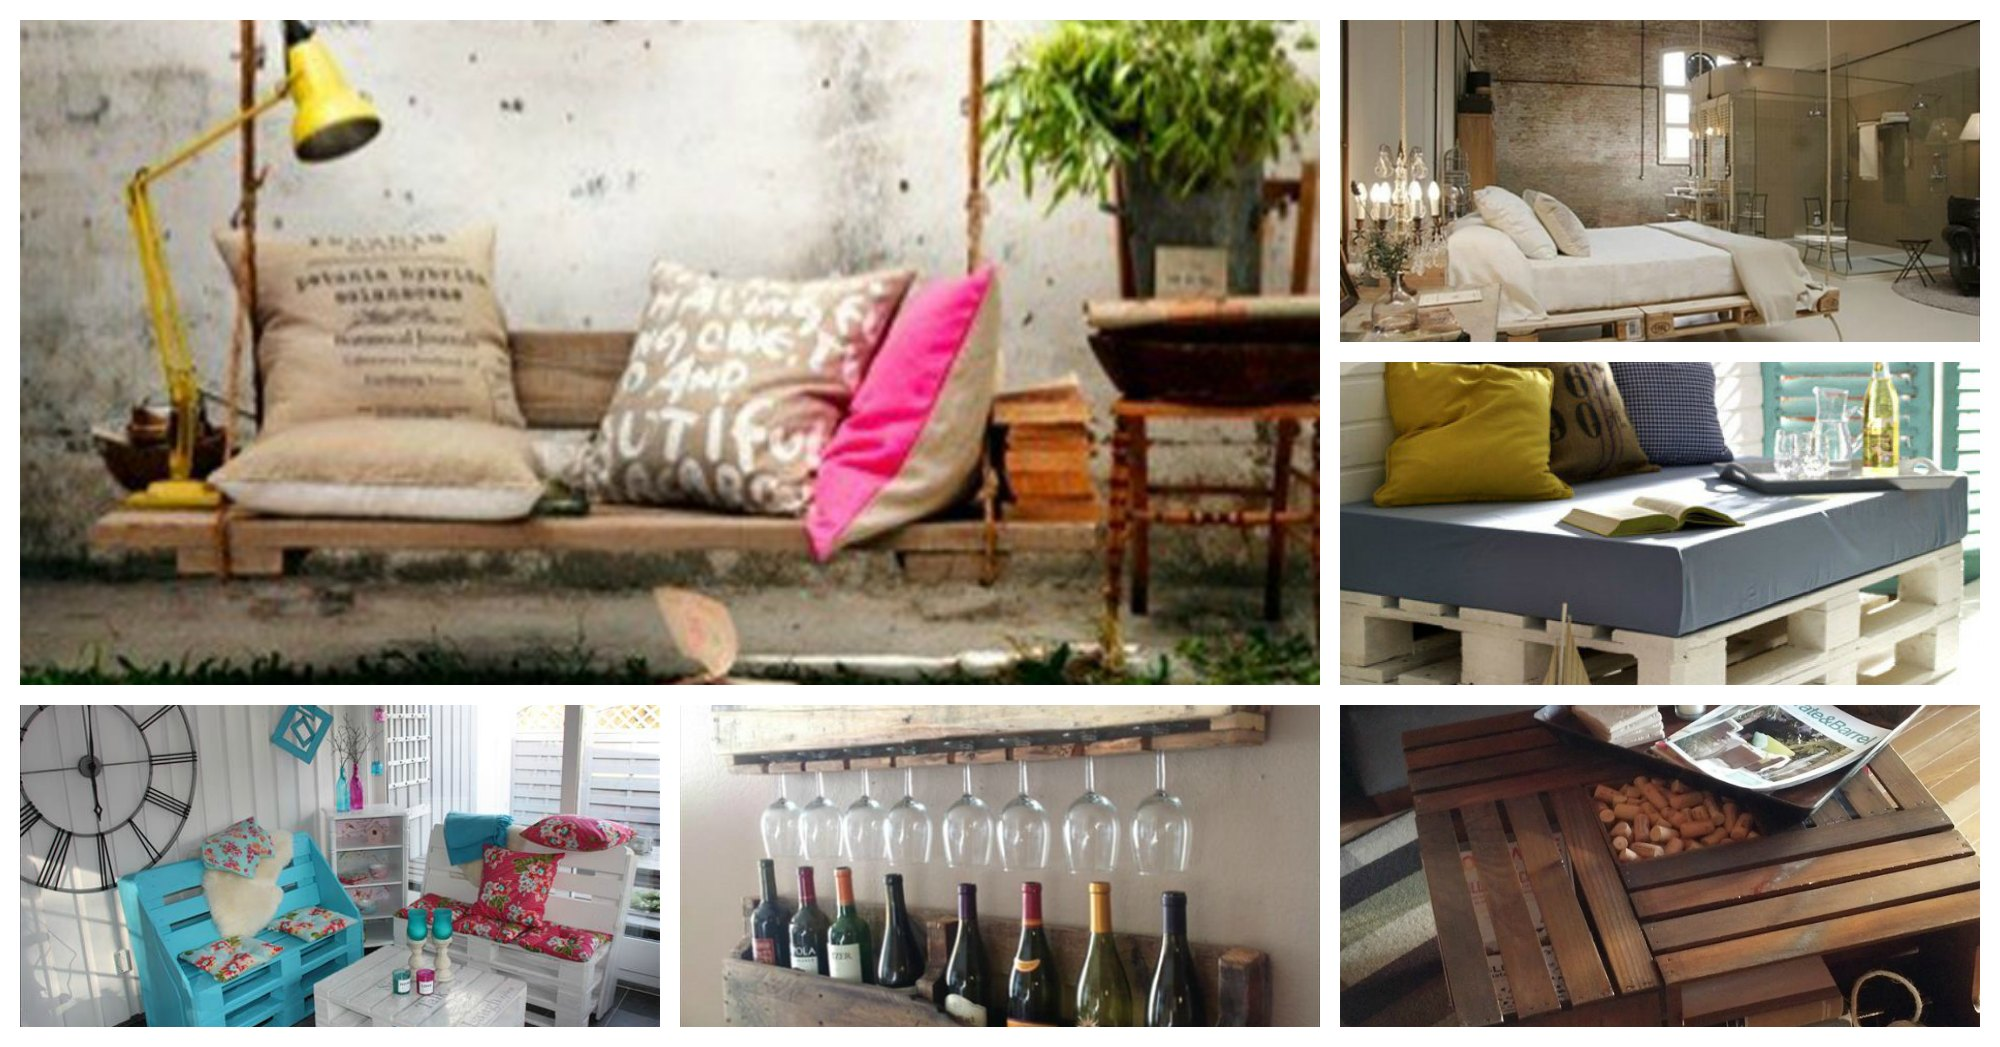 20 ideas creativas para reciclar palets de madera - Ideas con palets de madera ...